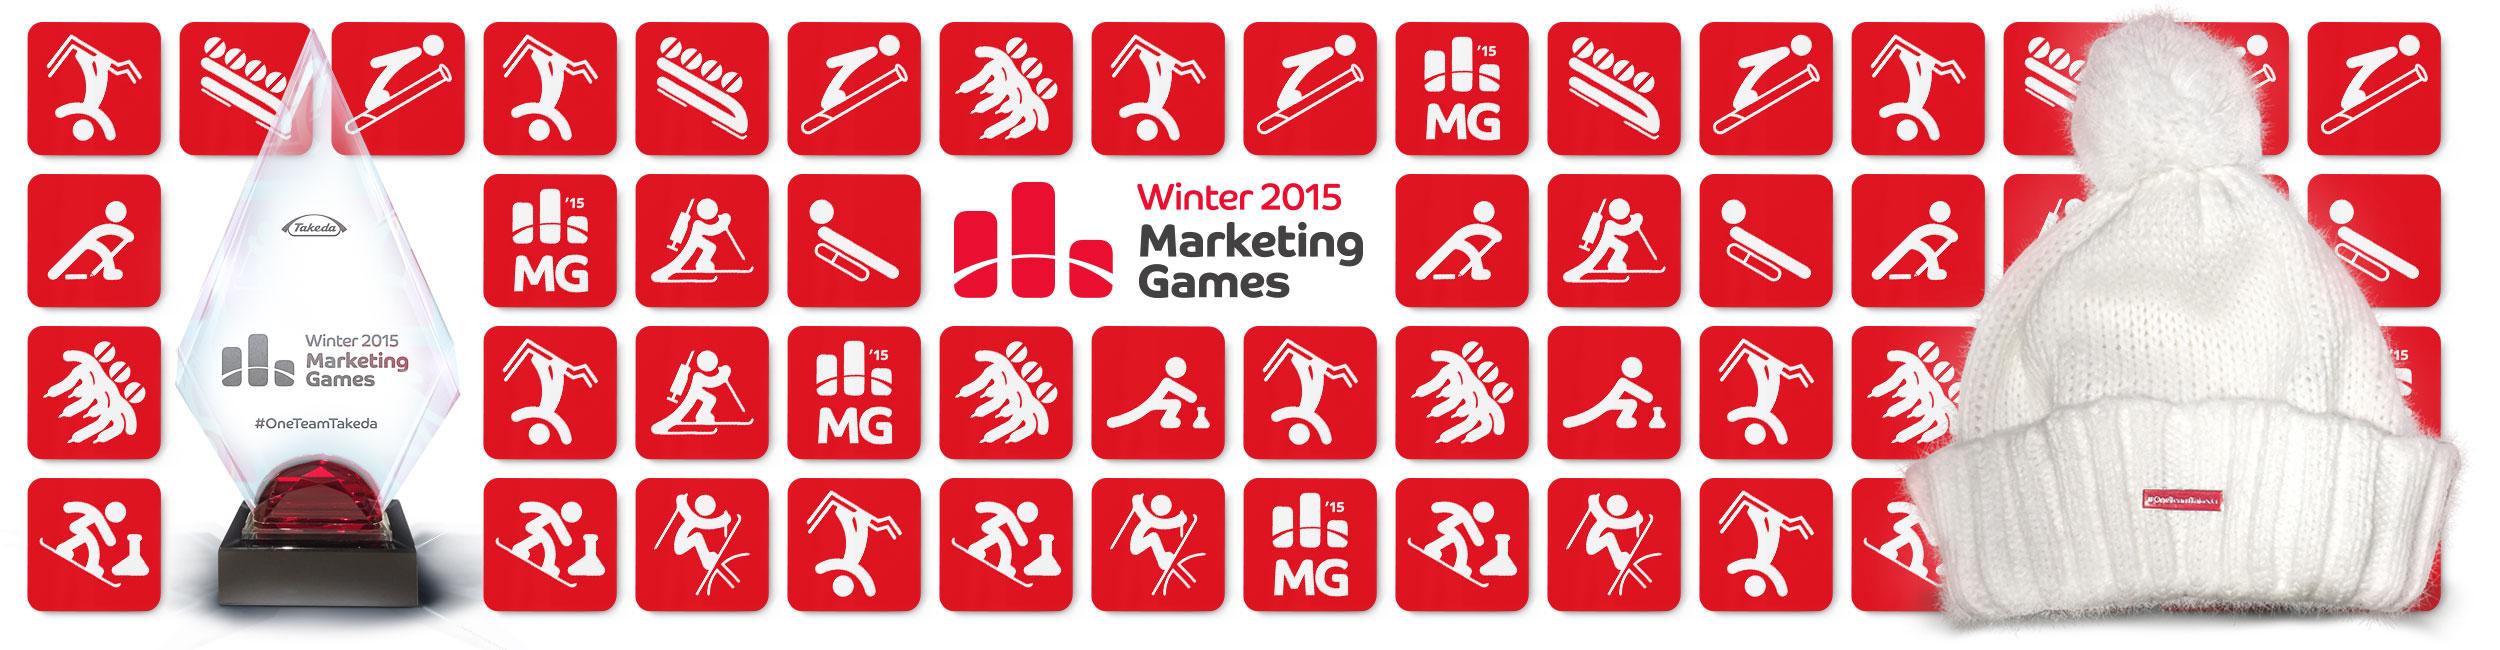 Winter Marketing Games 2015